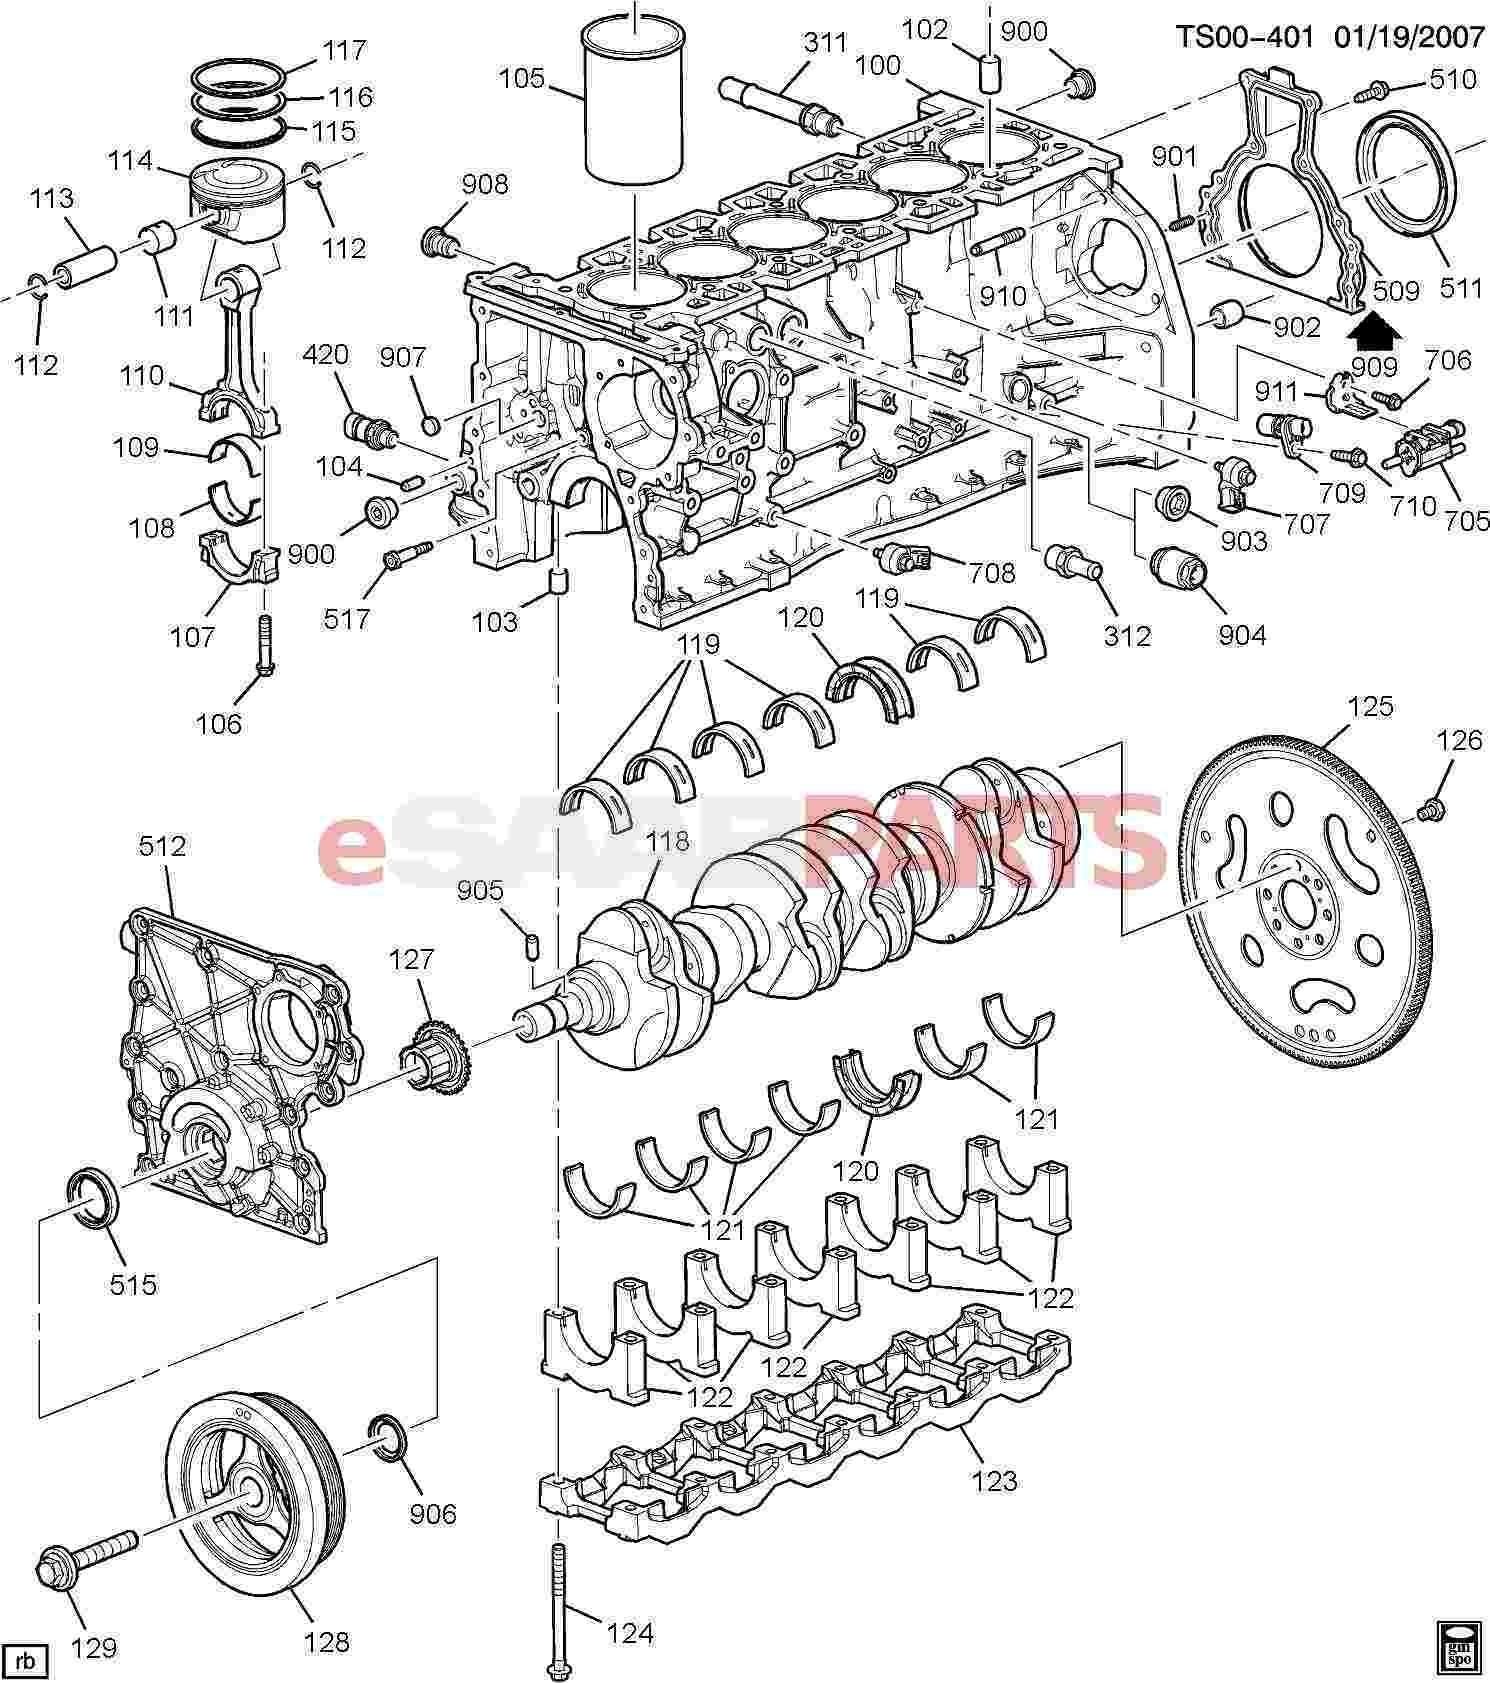 2004 Trailblazer Engine Diagram 2000 Chevy S10 Wiring Diagram Awesome 94 Chevy S10 Transmission Of 2004 Trailblazer Engine Diagram